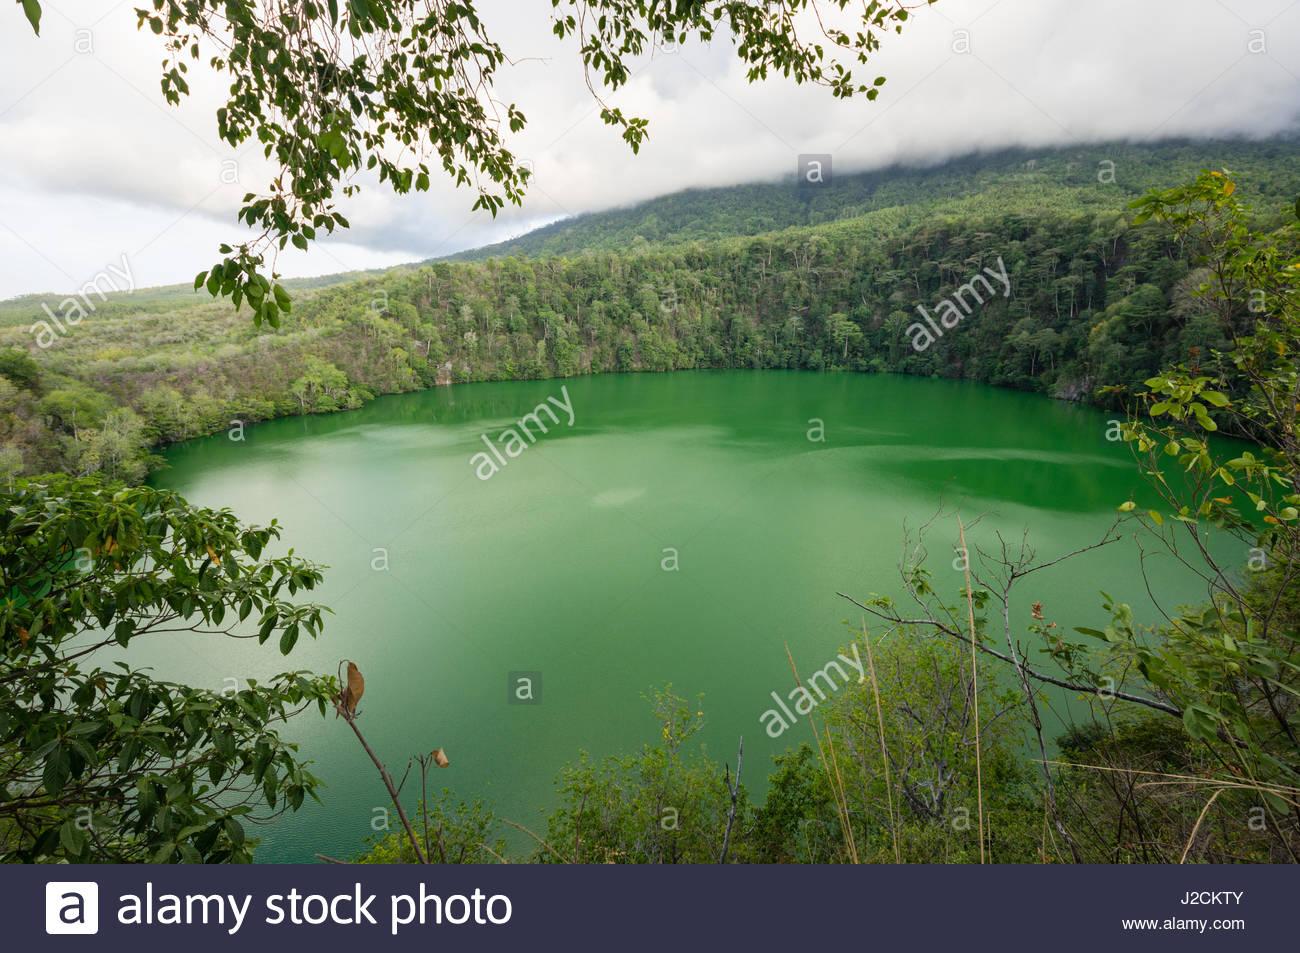 Ternate Island Indonesia Stock Photos Maluku Utara Kota Green Lake